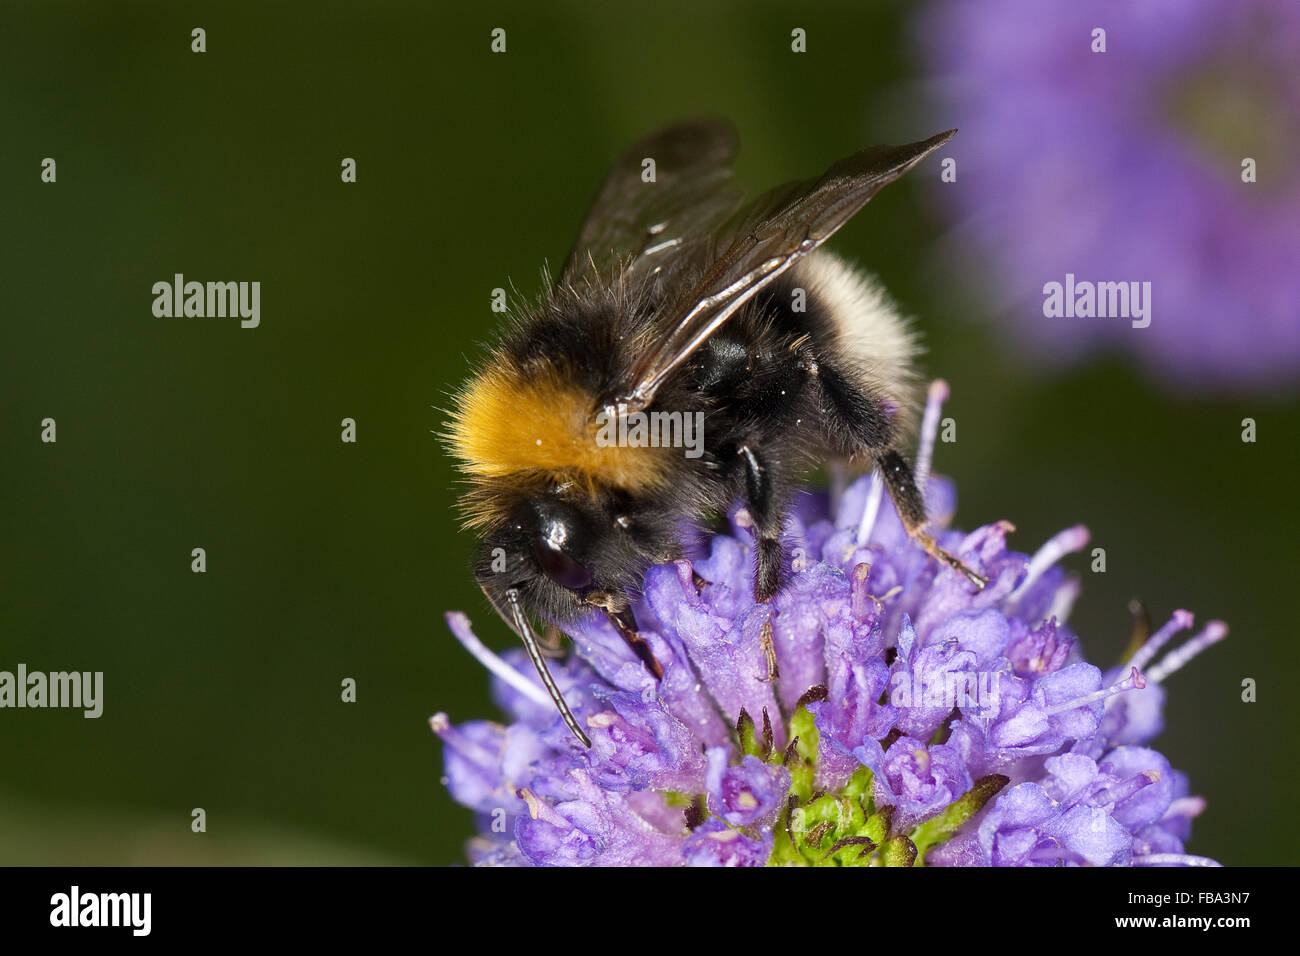 Cuckoo bee, Schmarotzerhummel, Kuckuckshummel, Schmarotzer-Hummel, Kuckucks-Hummel, Psithyrus norvegicus oder Bombus - Stock Image